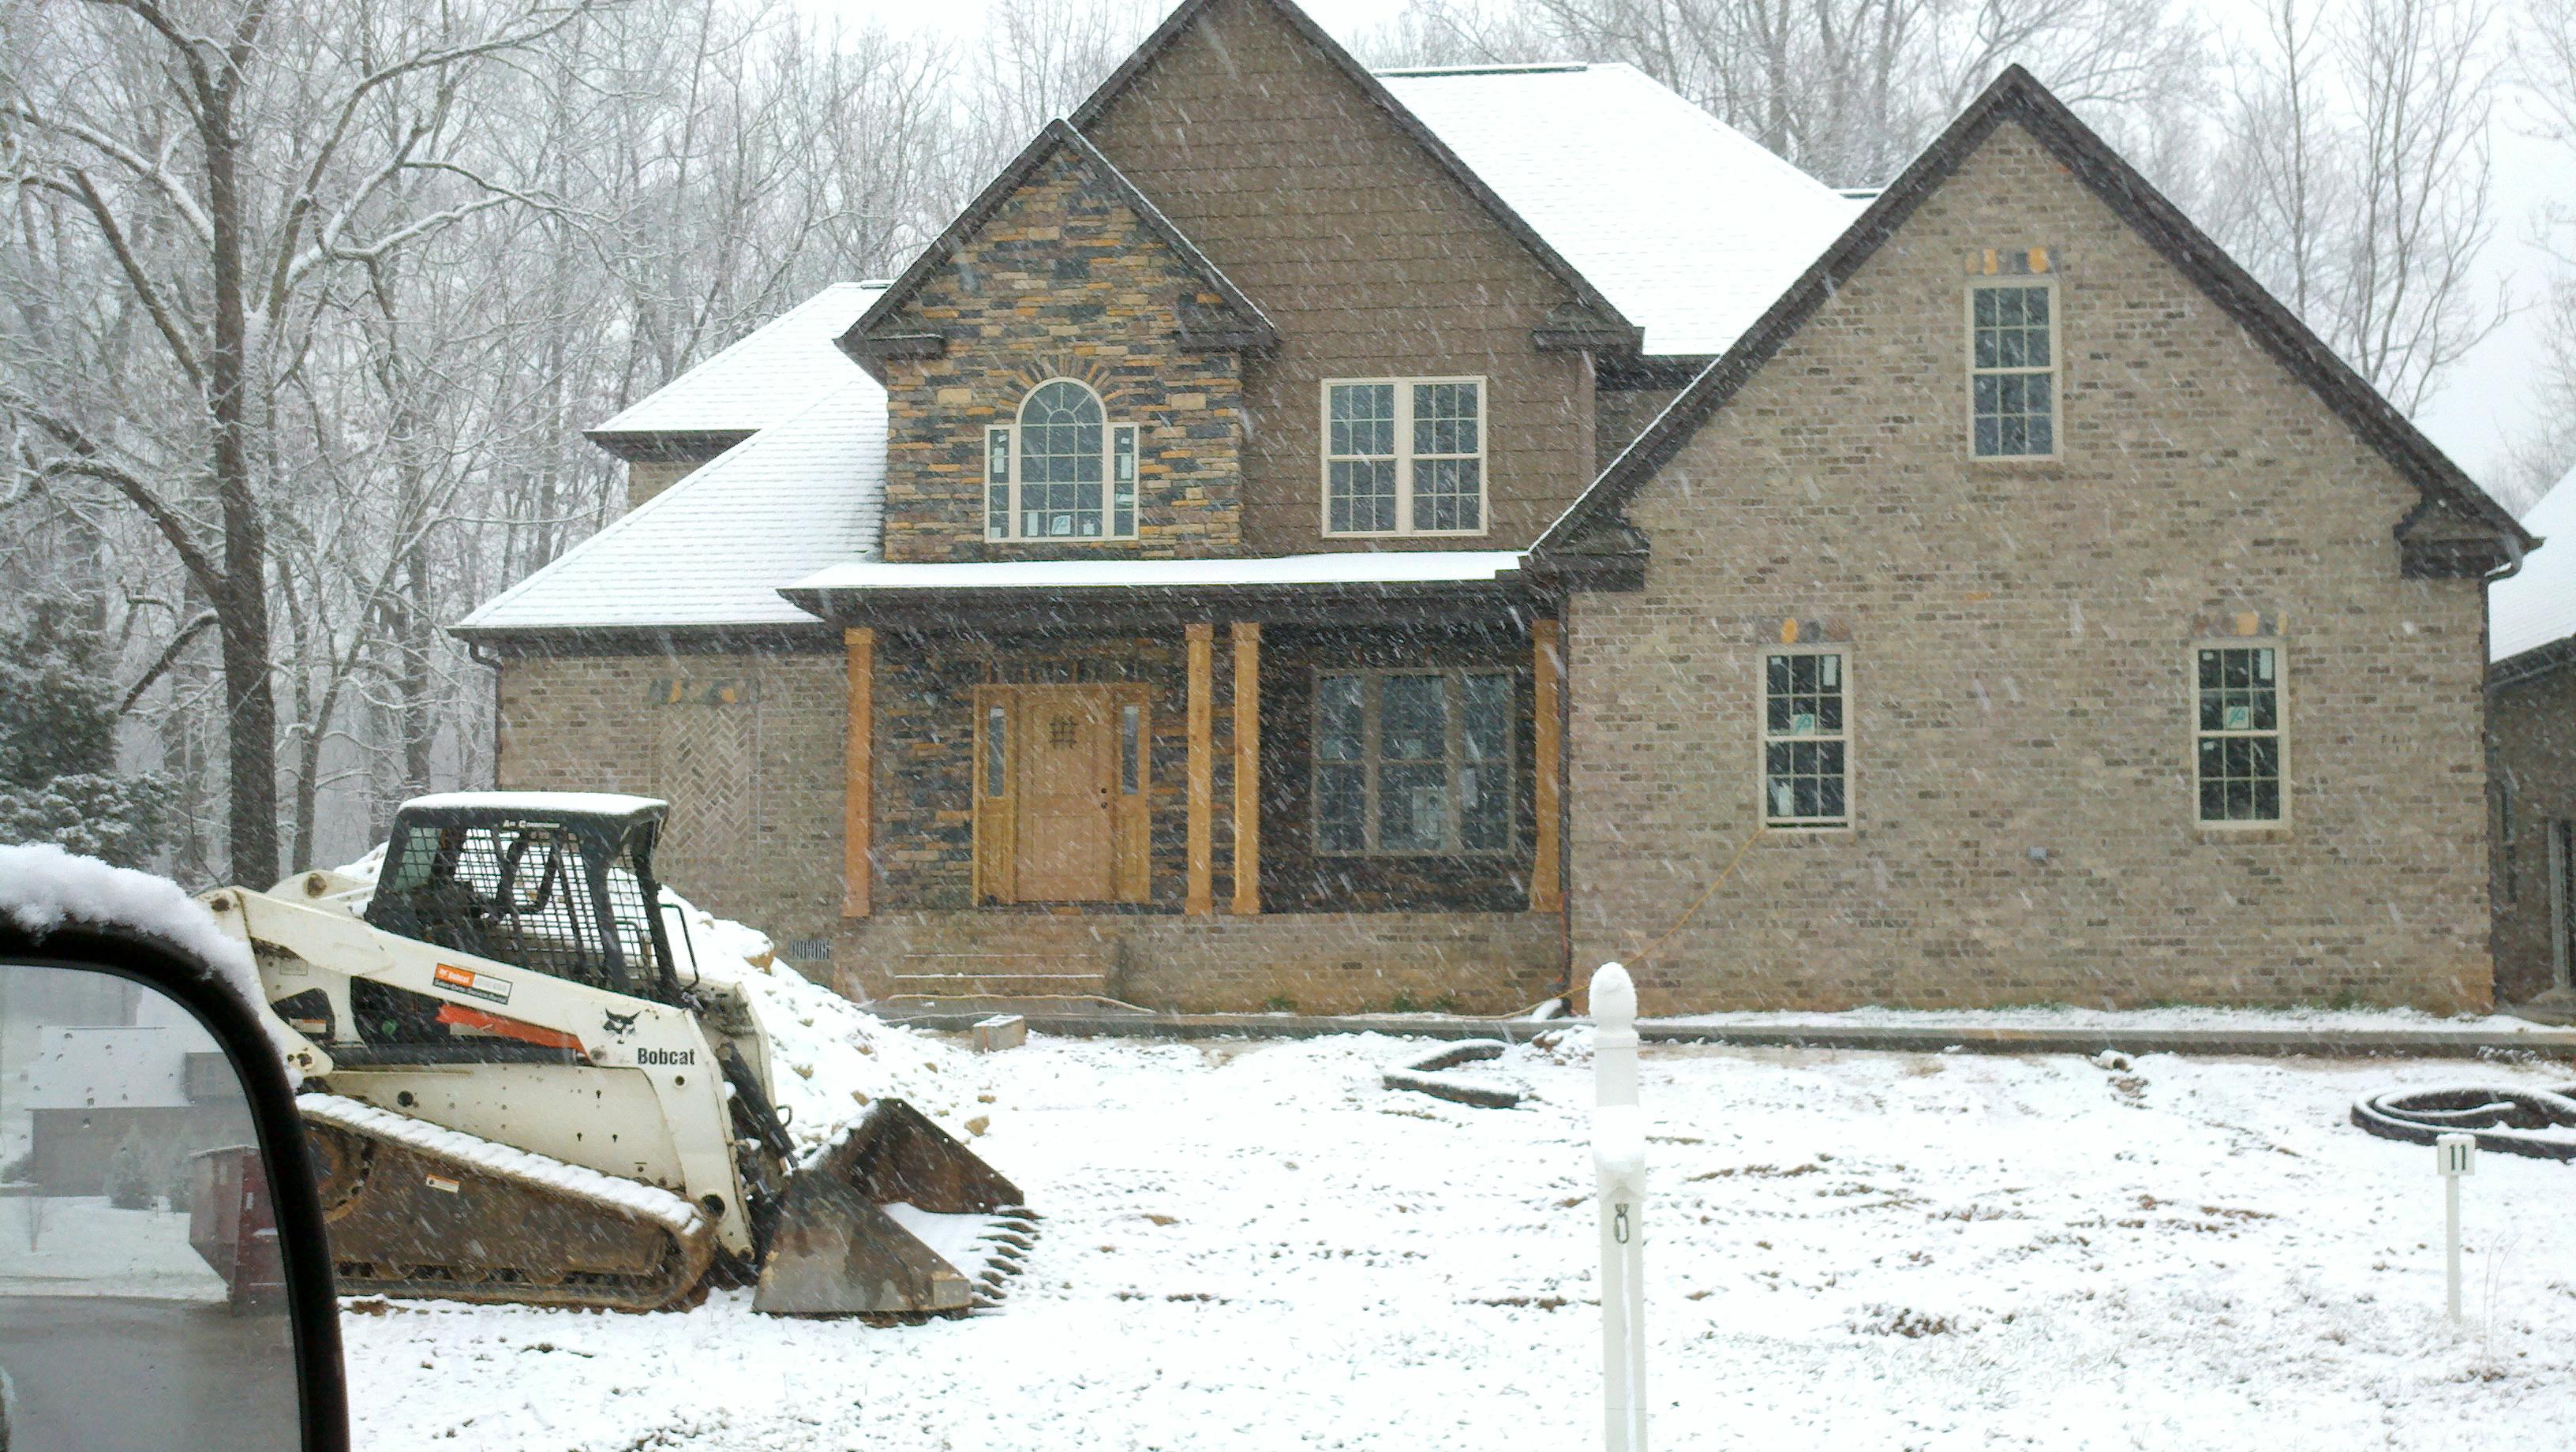 2010-12-04_13-41-46_685